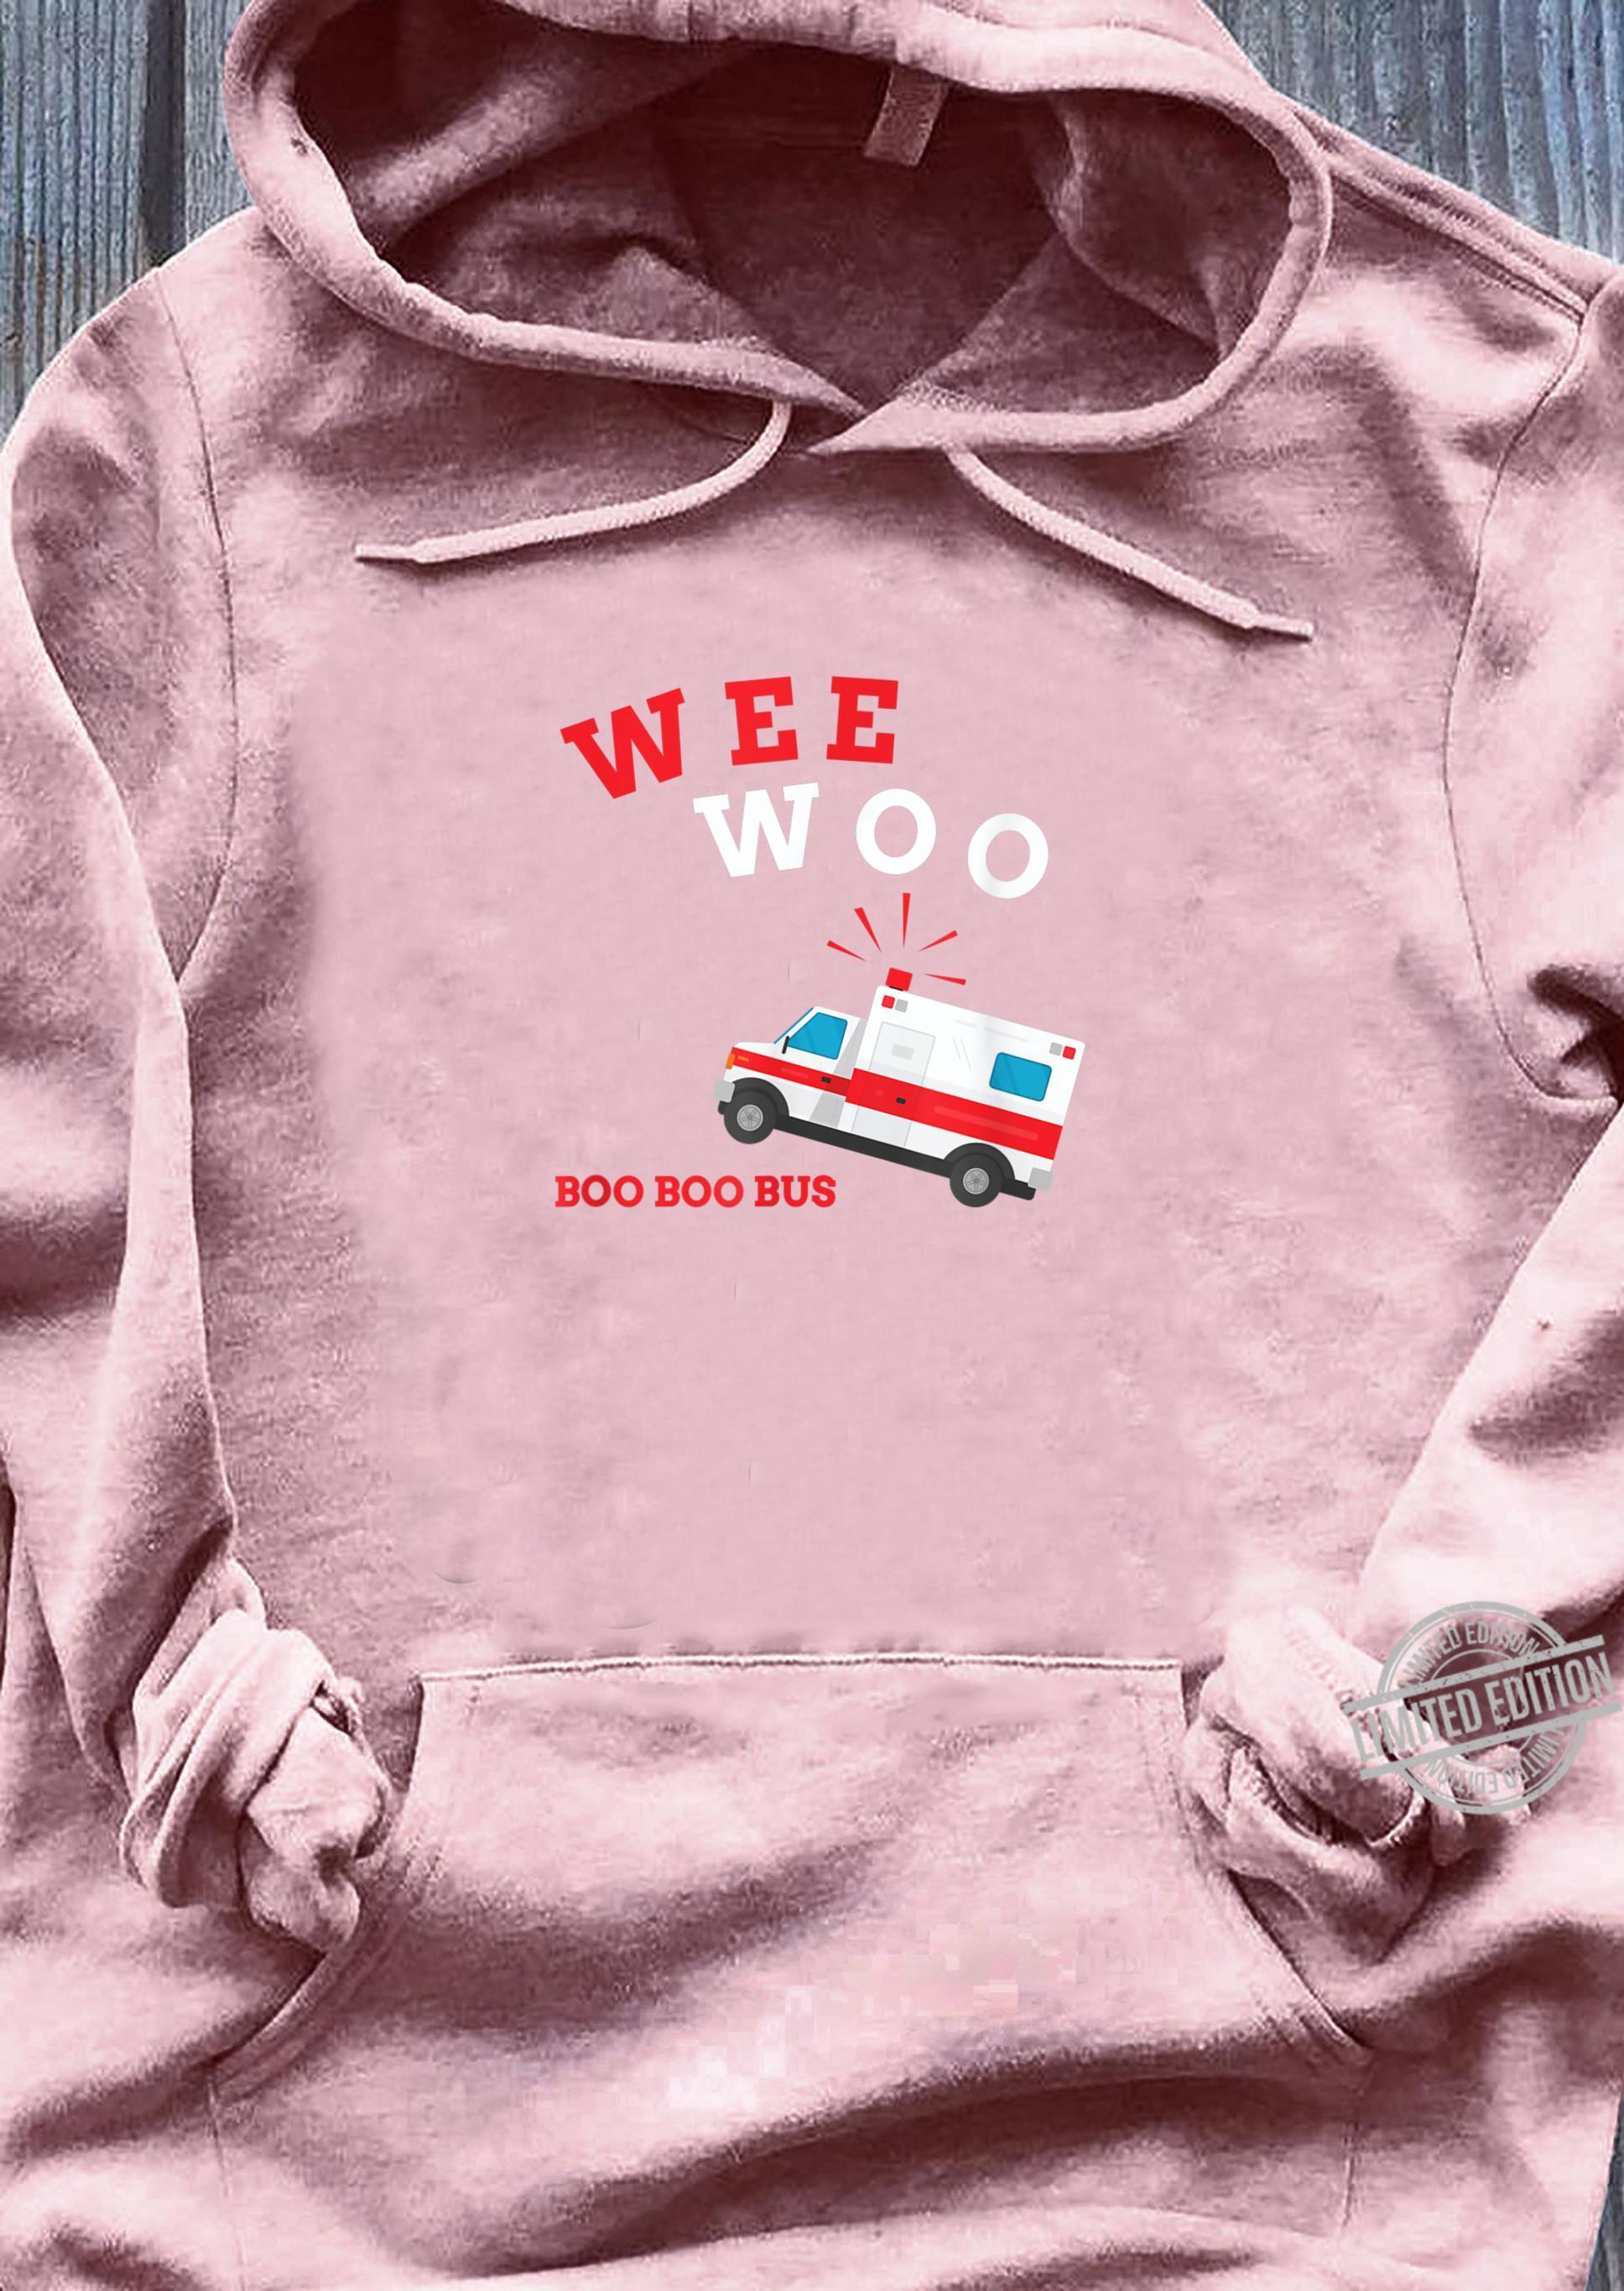 Emt Sanitäter Krankenwagen Boo Boo Bus Wee Woo Shirt sweater